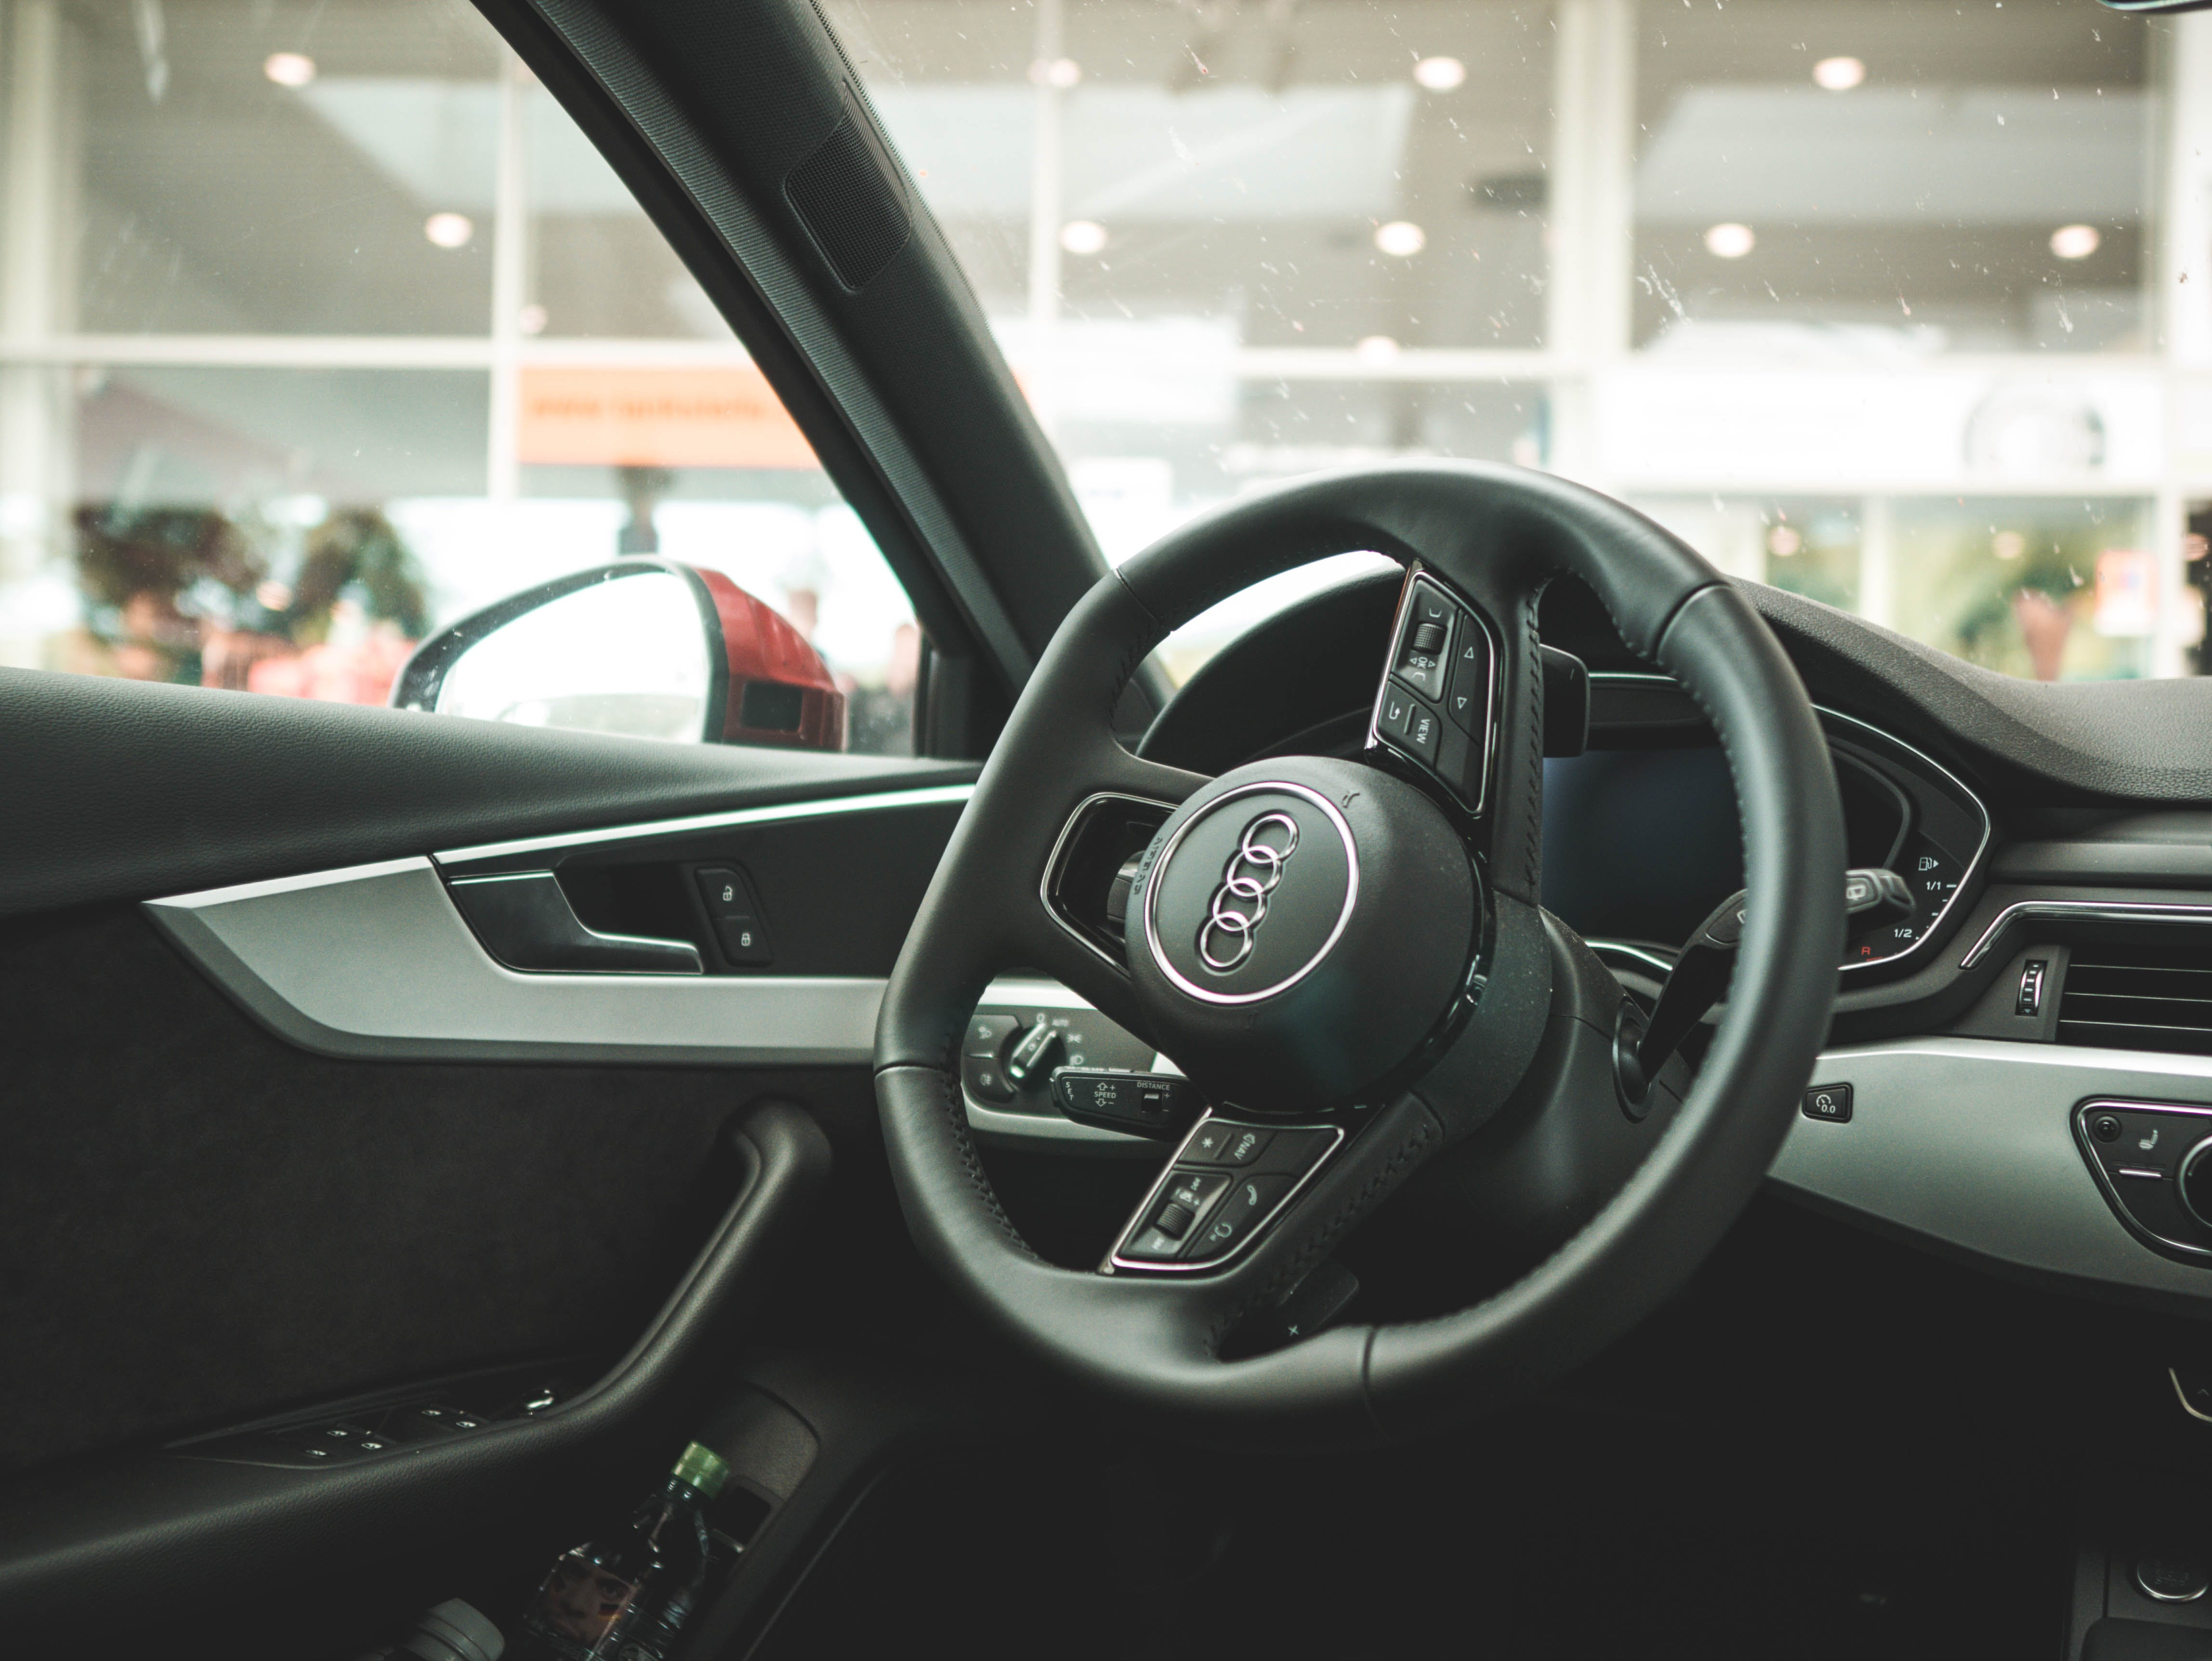 Black and Gray Audi Vehicle Interior